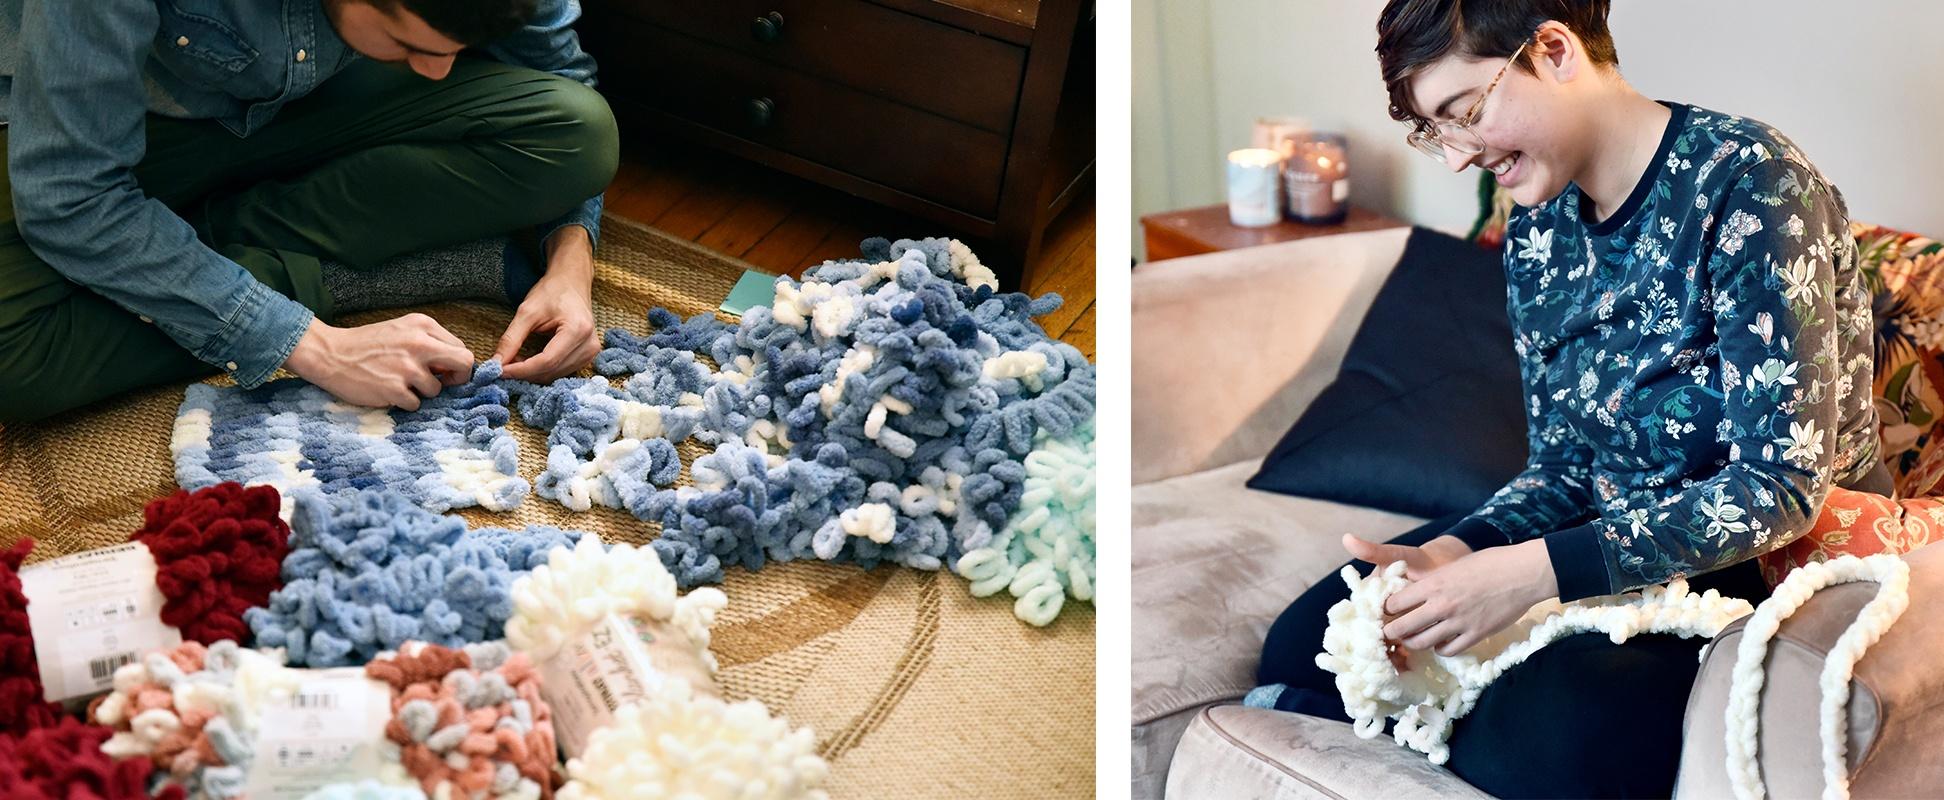 Teach how to EZ-Knitting